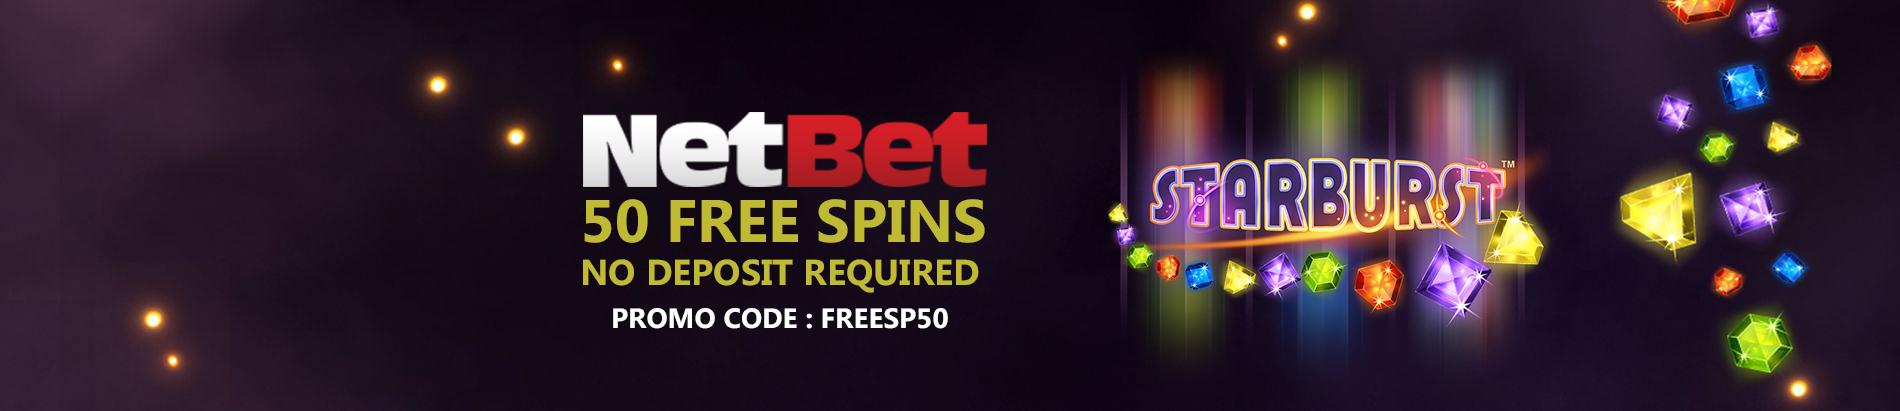 NetBet no deposit bonus